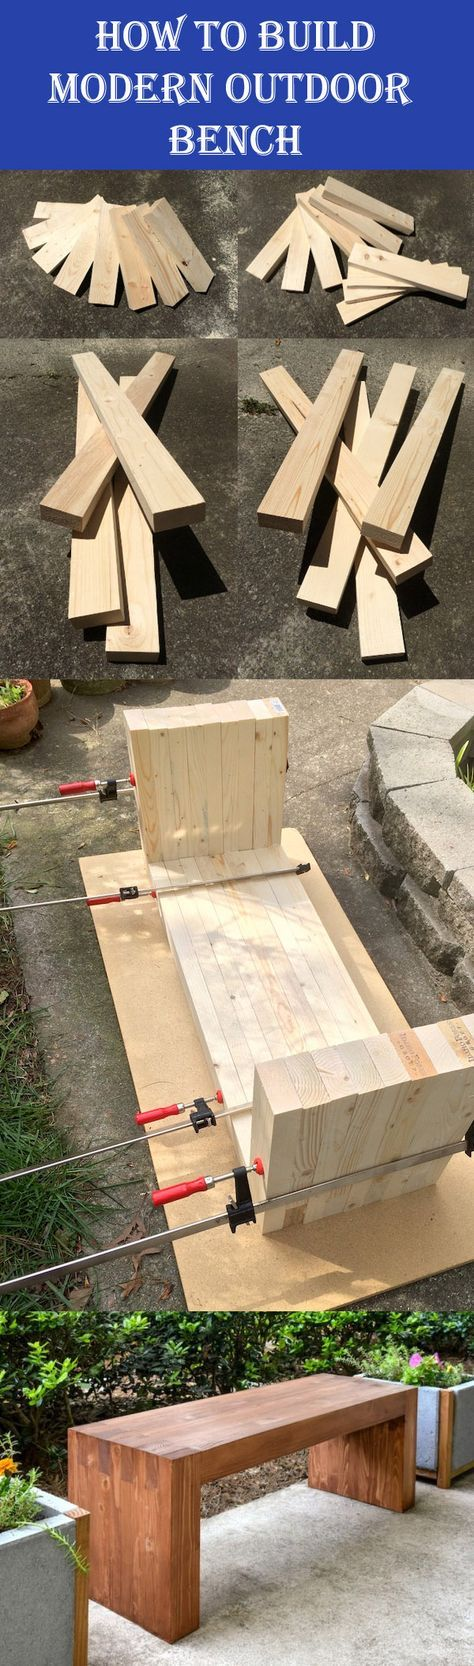 DIY Modern Outdoor Bench